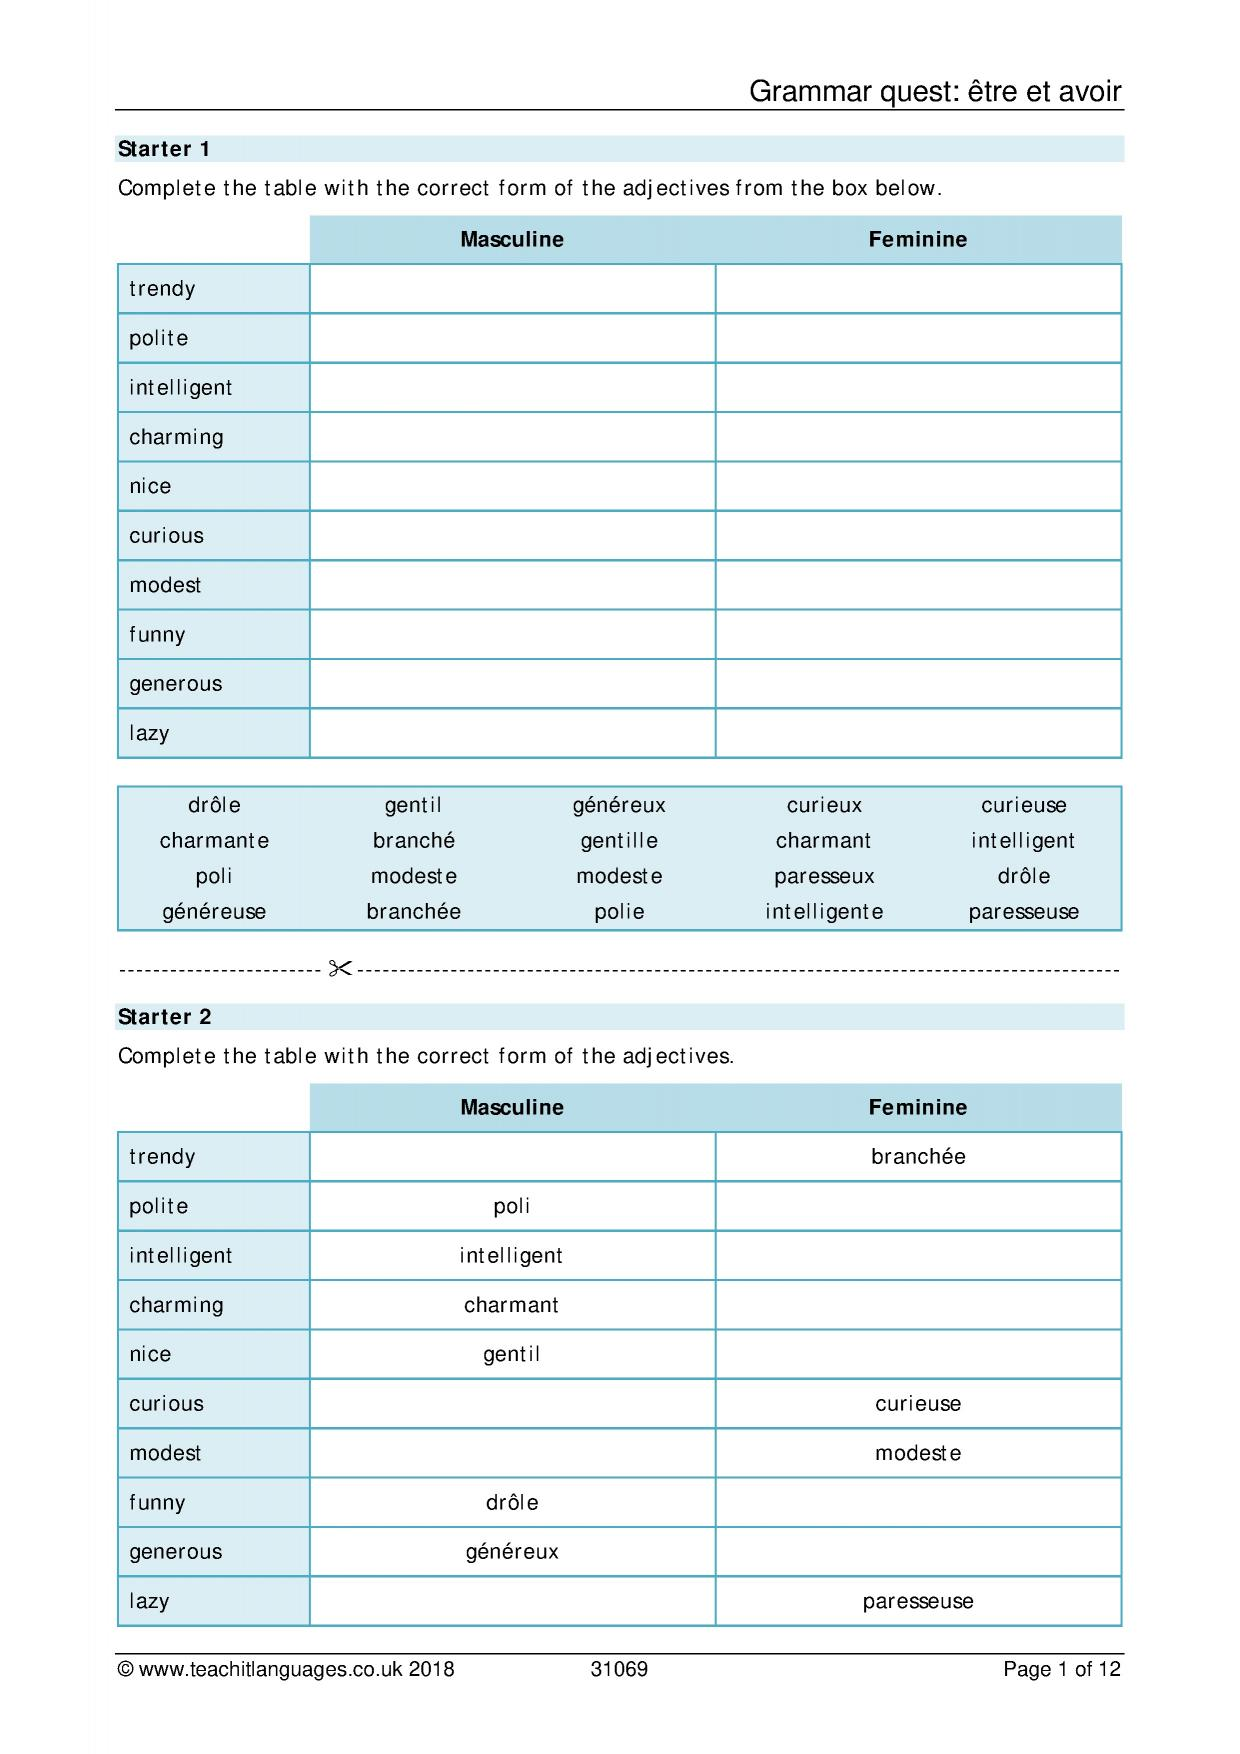 French Language Teaching Resources Teachit Languages